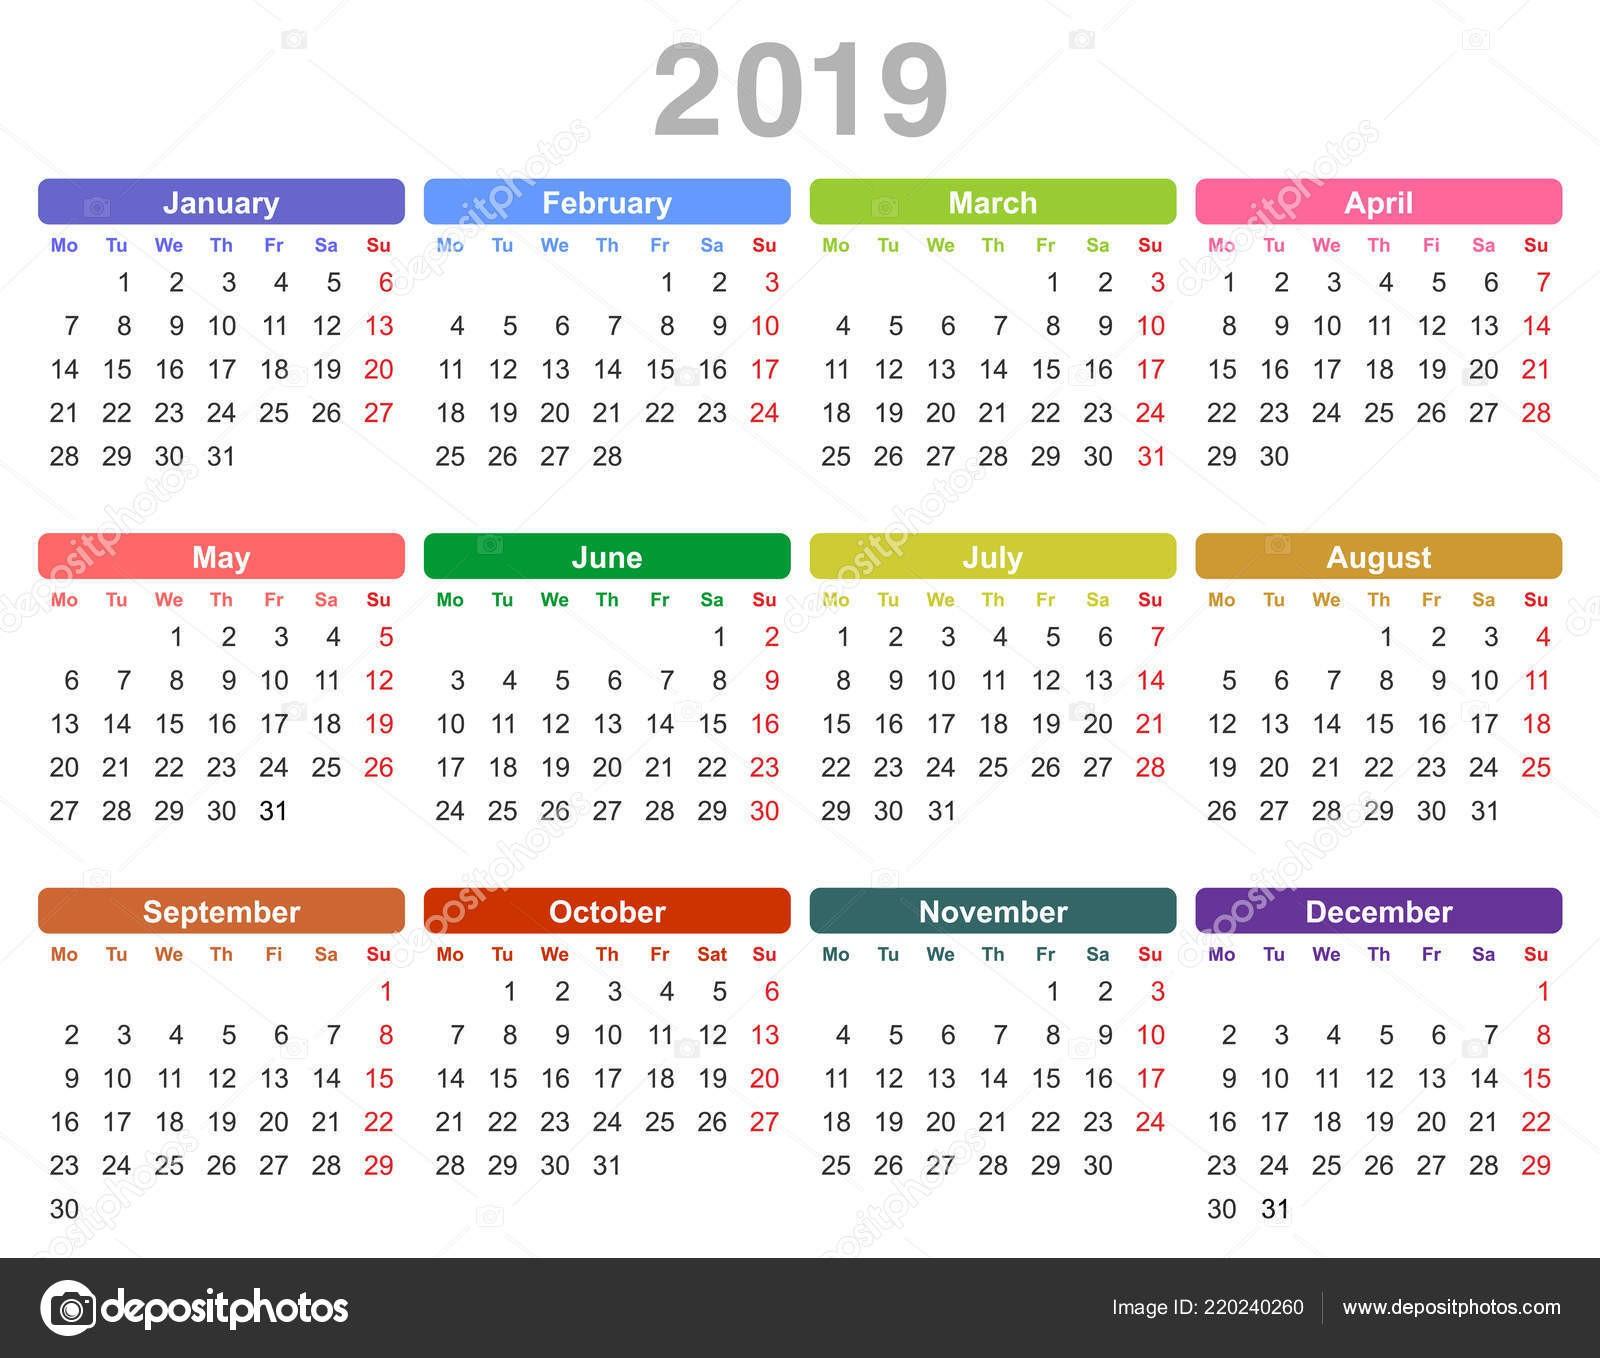 Calendario 2019 Vector Free Más Populares Ilustracja Wektorowa 2019 Roku Roczny Kalendarz Kolor Poniedziałek Of Calendario 2019 Vector Free Más Arriba-a-fecha Info Regarding January Calendar 2019 Singapore Calendar Online 2019